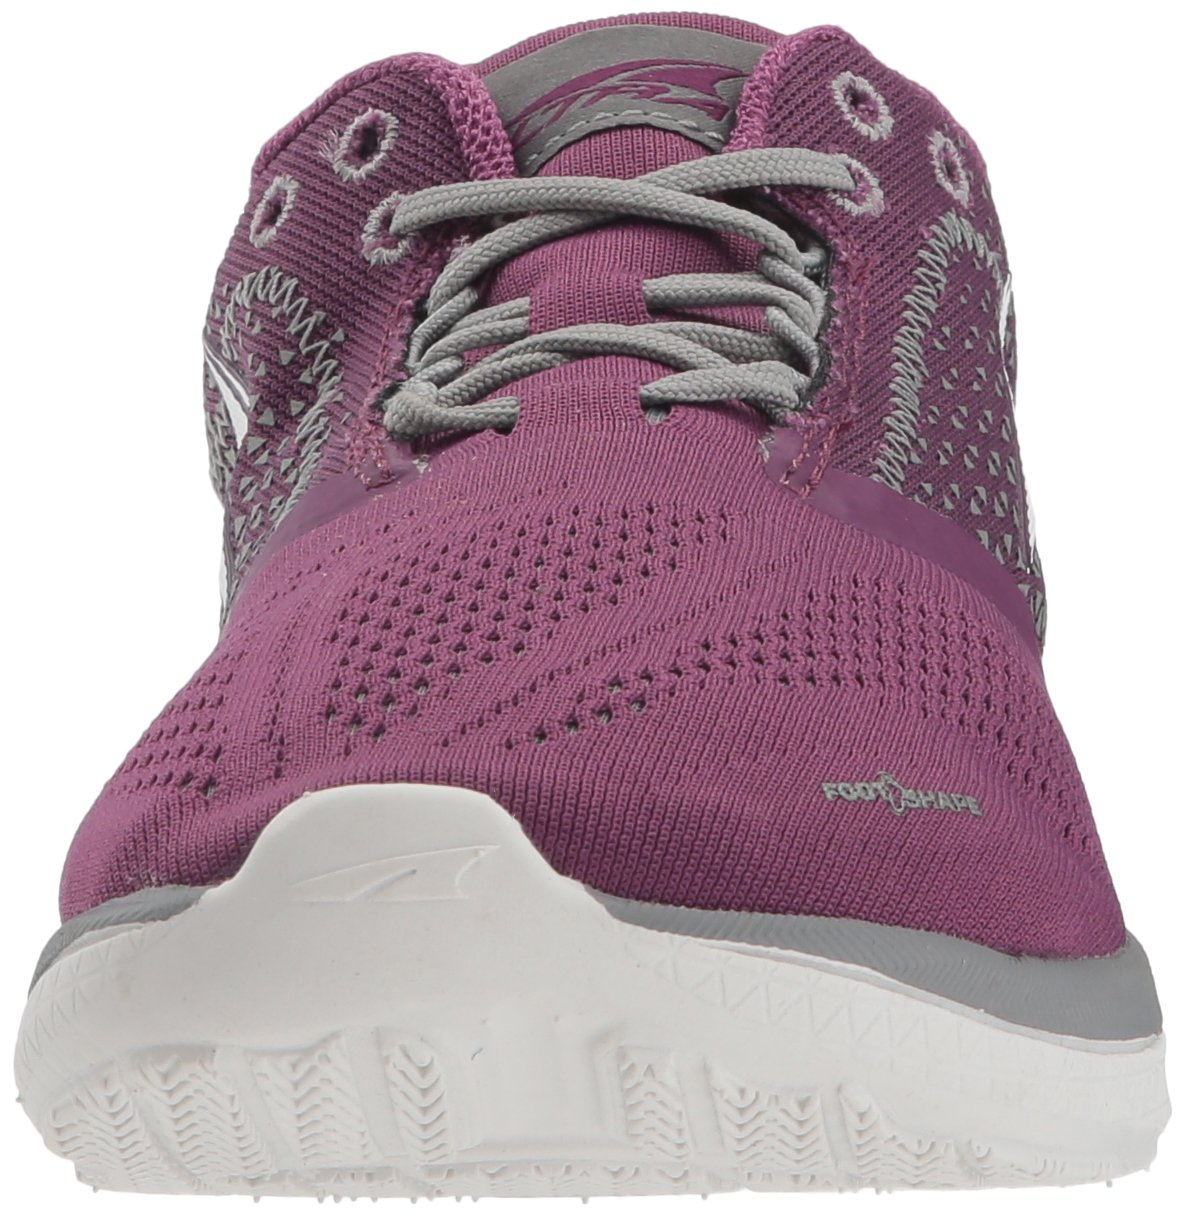 Altra Women's Solstice Sneaker, Purple, 5.5 Regular US by Altra (Image #4)